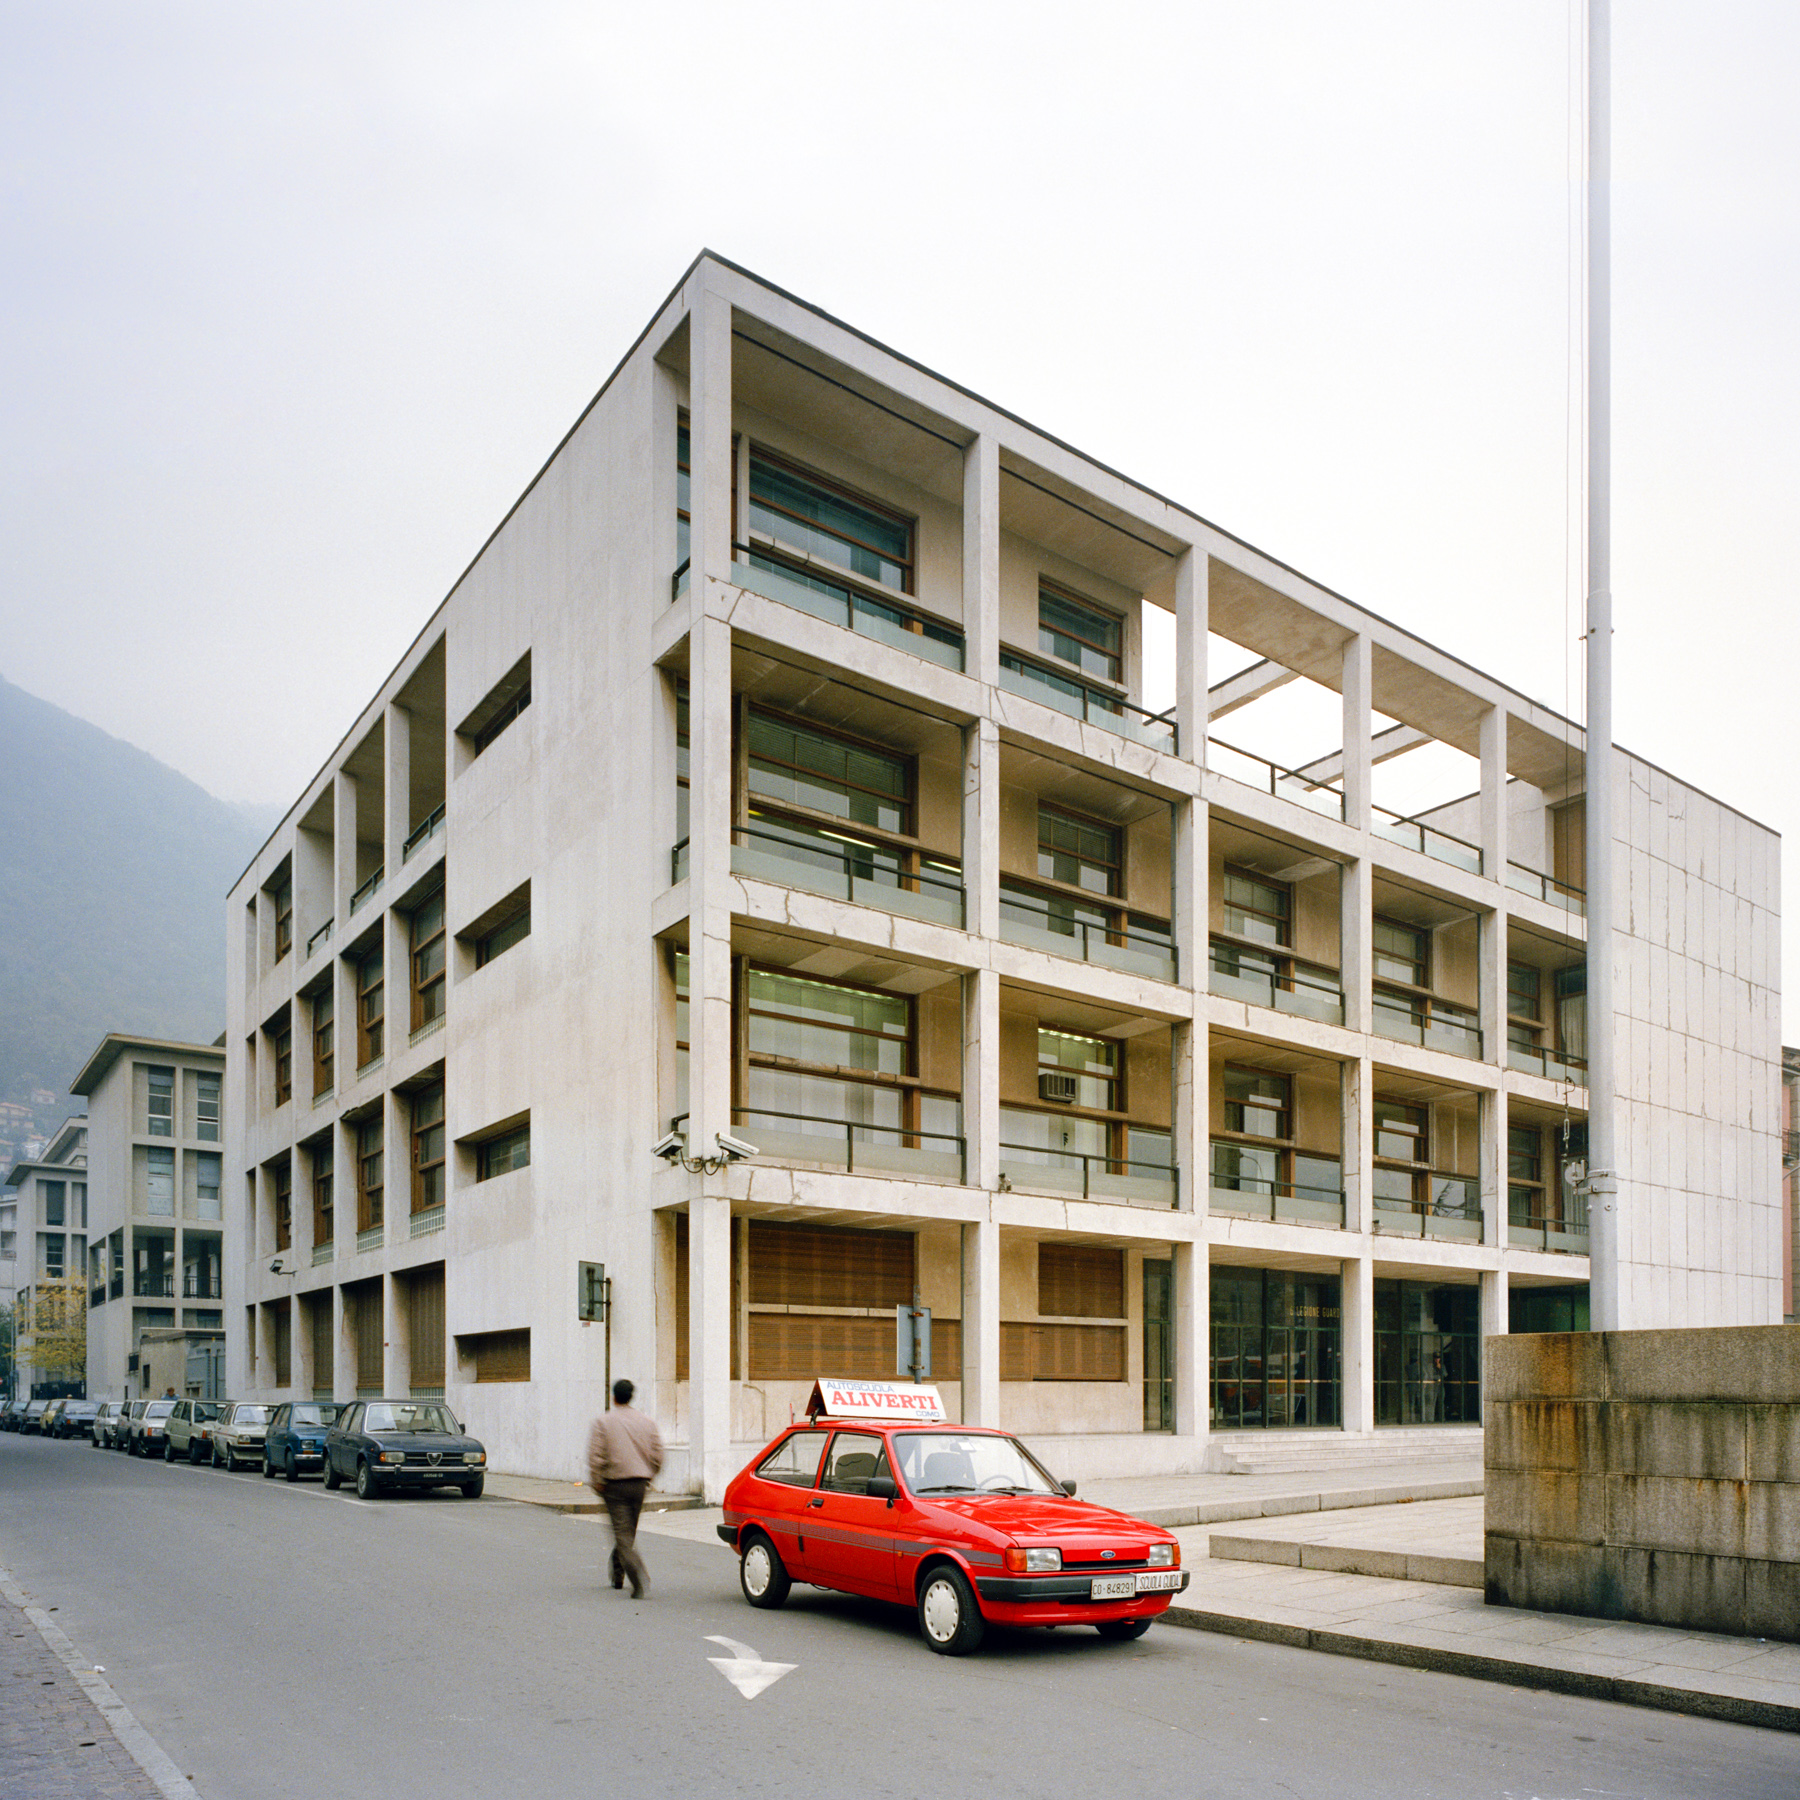 terragni-12.jpg